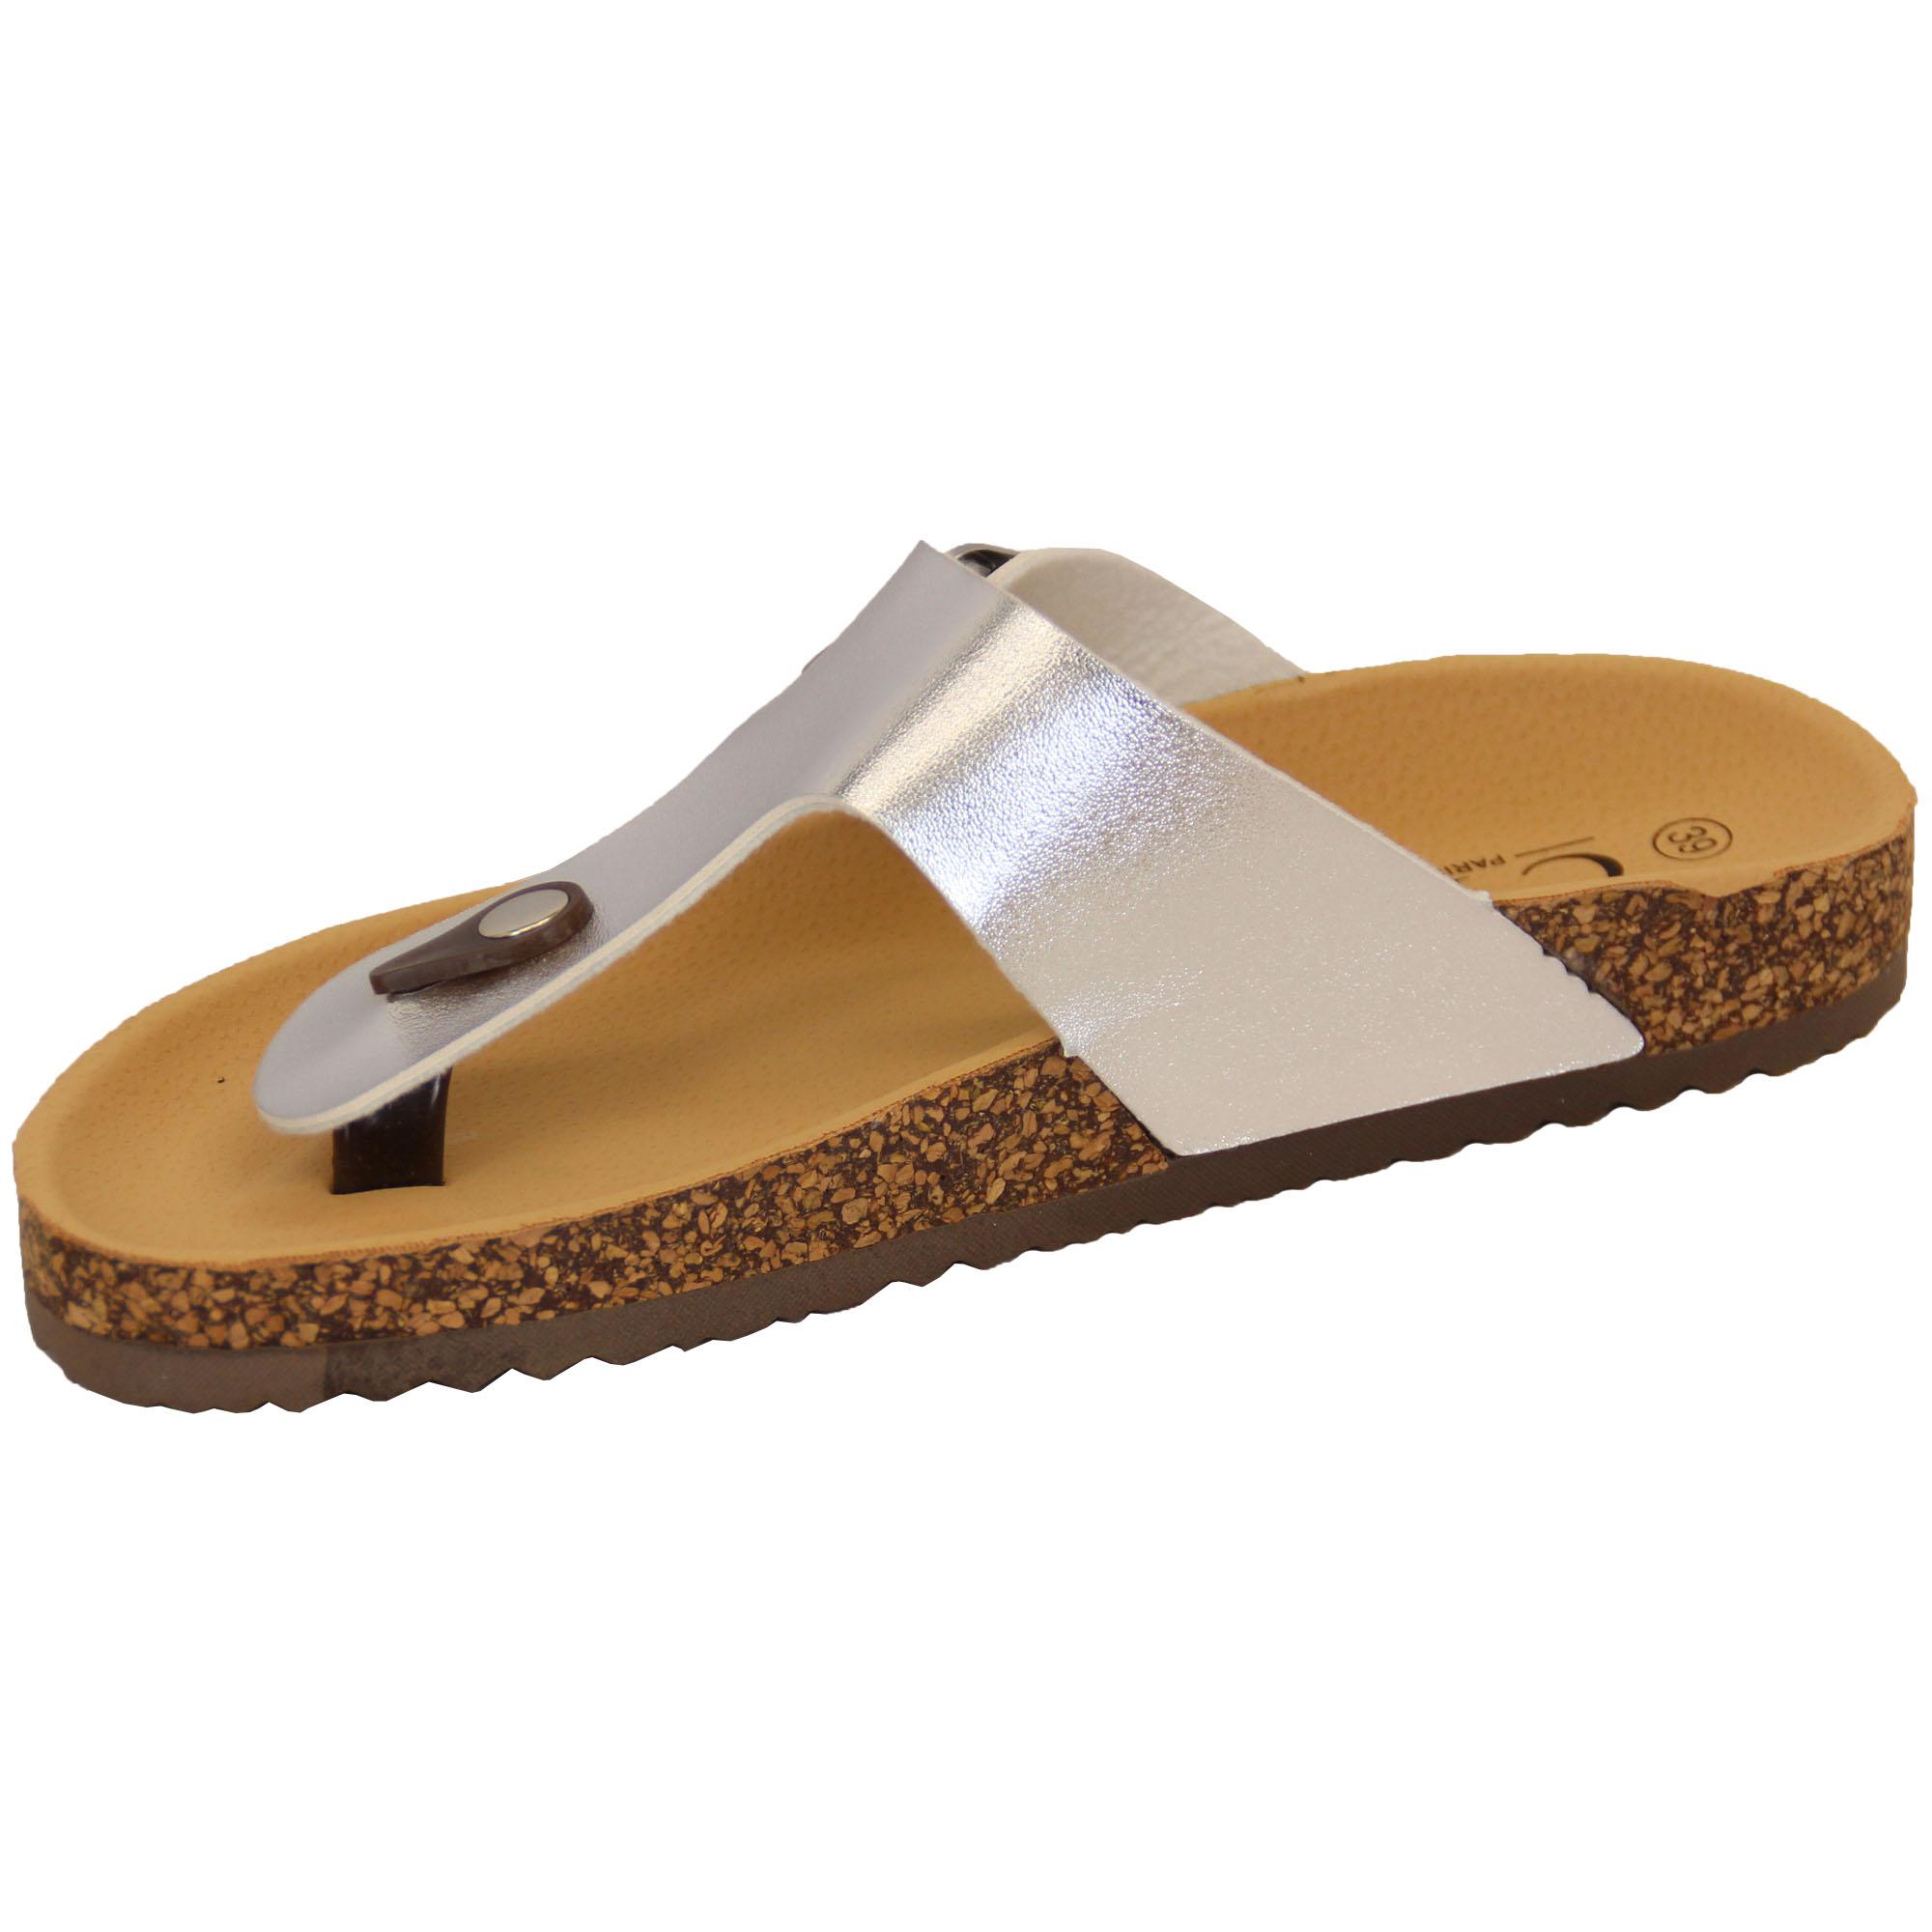 123cb1439e27 Ladies Slip On Mule Sandals Womens Flat Toe Post Patent Cork Flip ...